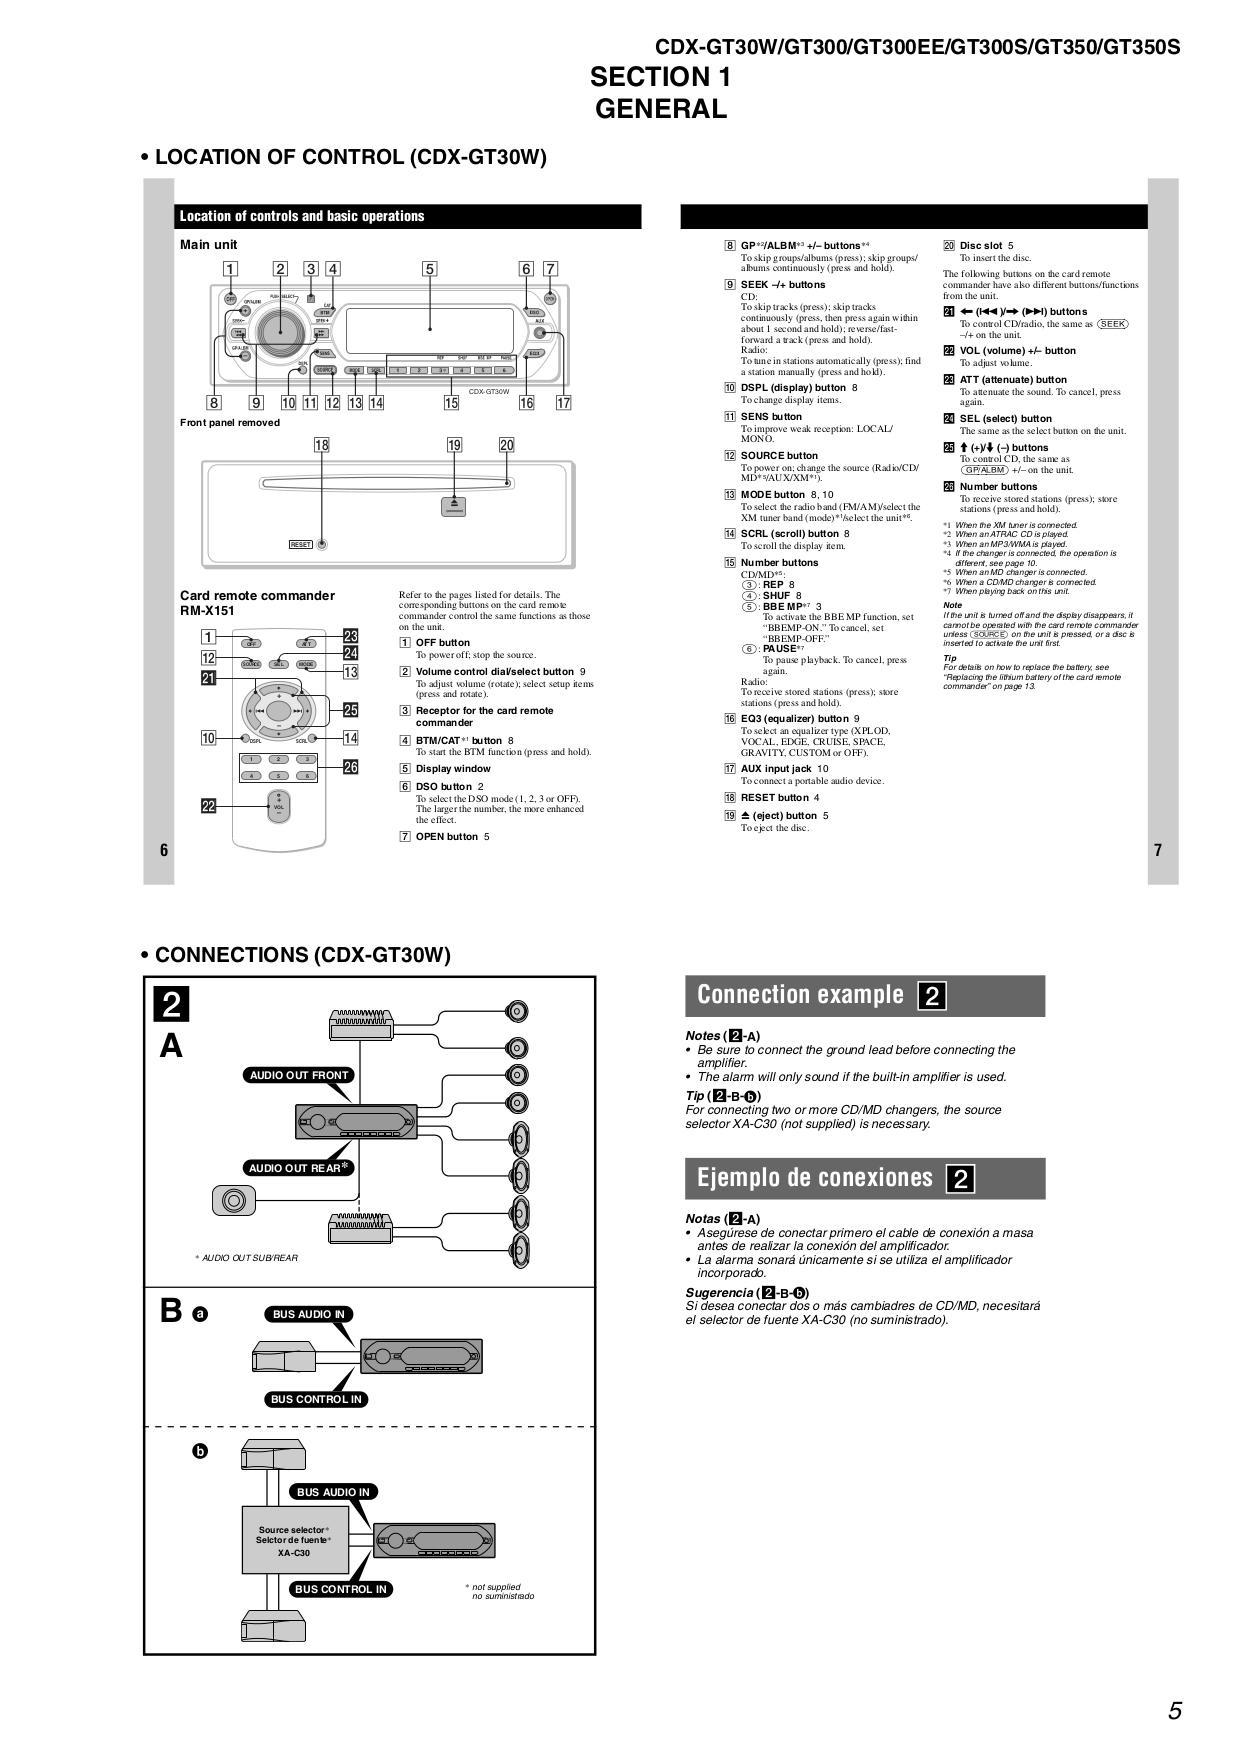 Cdx Gt310 Wiring Diagram